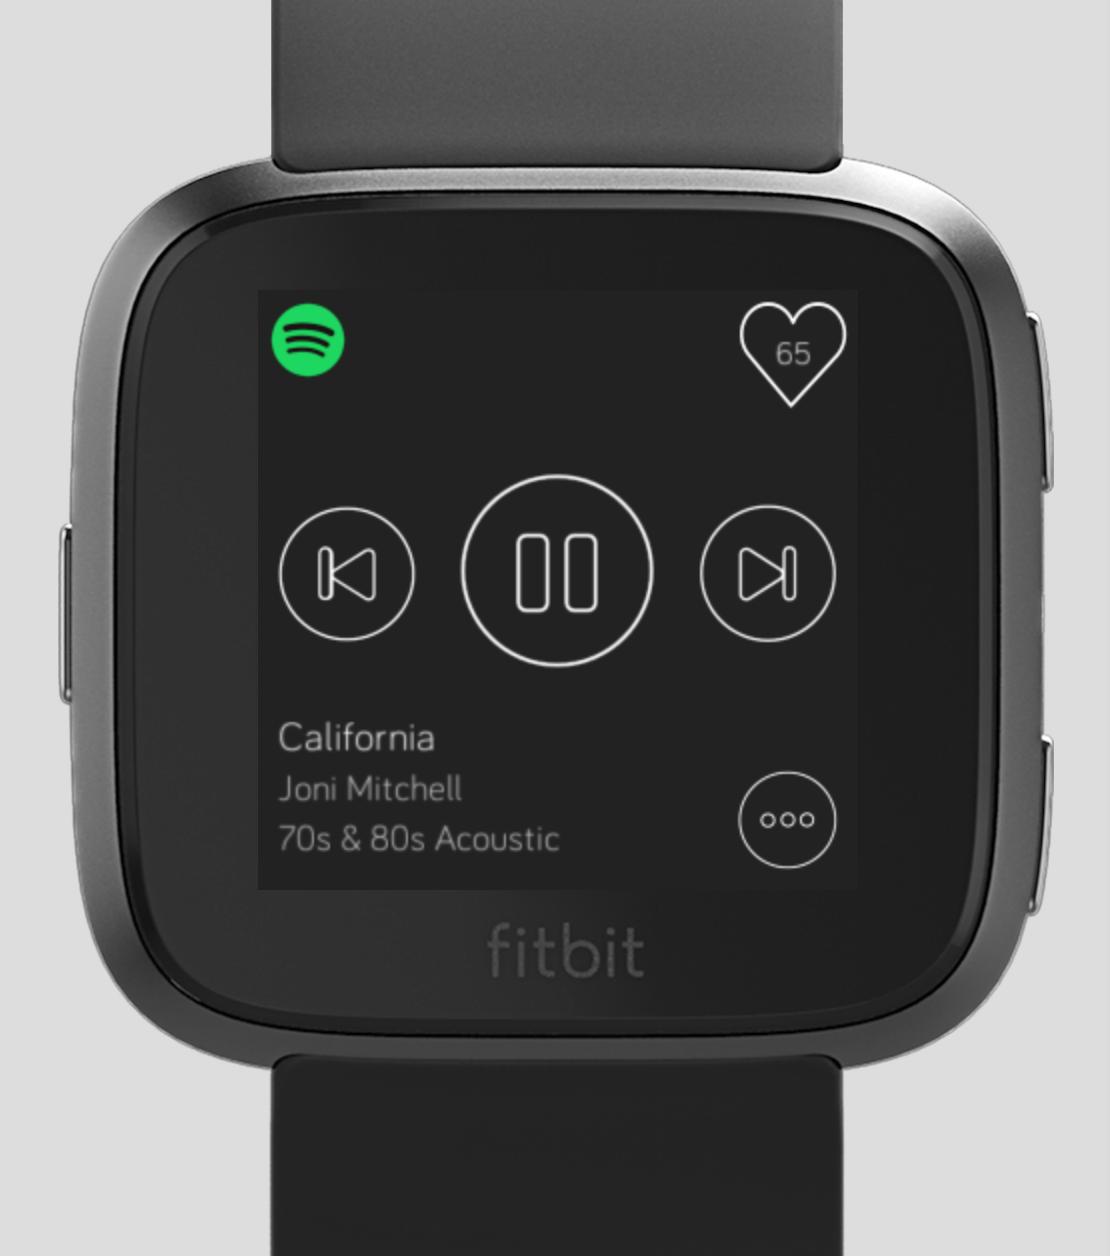 GitHub - TimeToogo/spotify-hr: Spotify HR app for the FitBit Versa